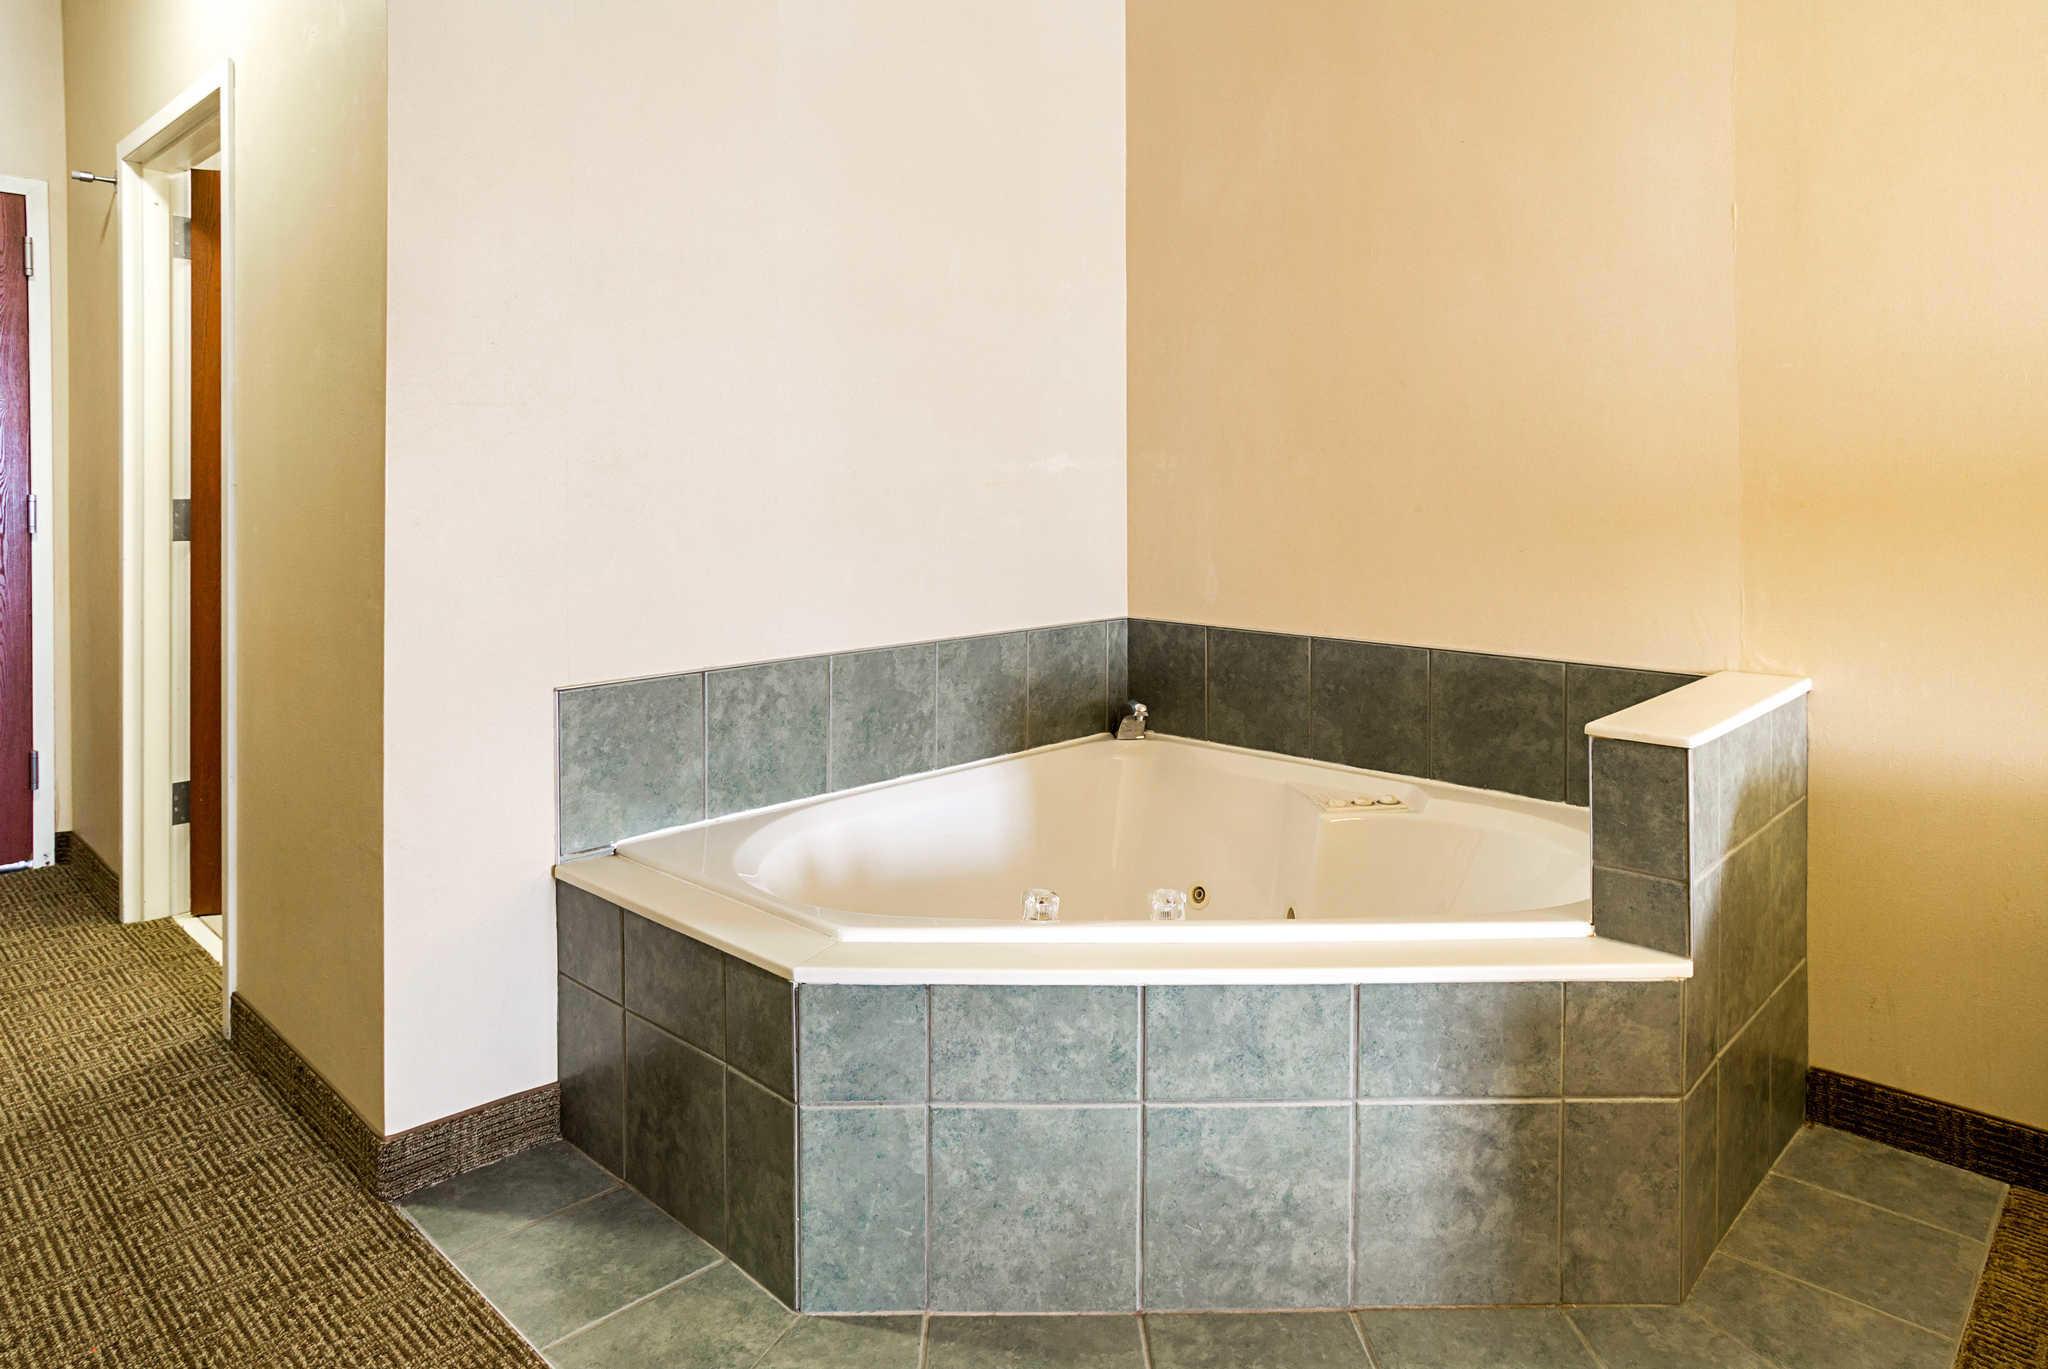 Comfort Suites image 31